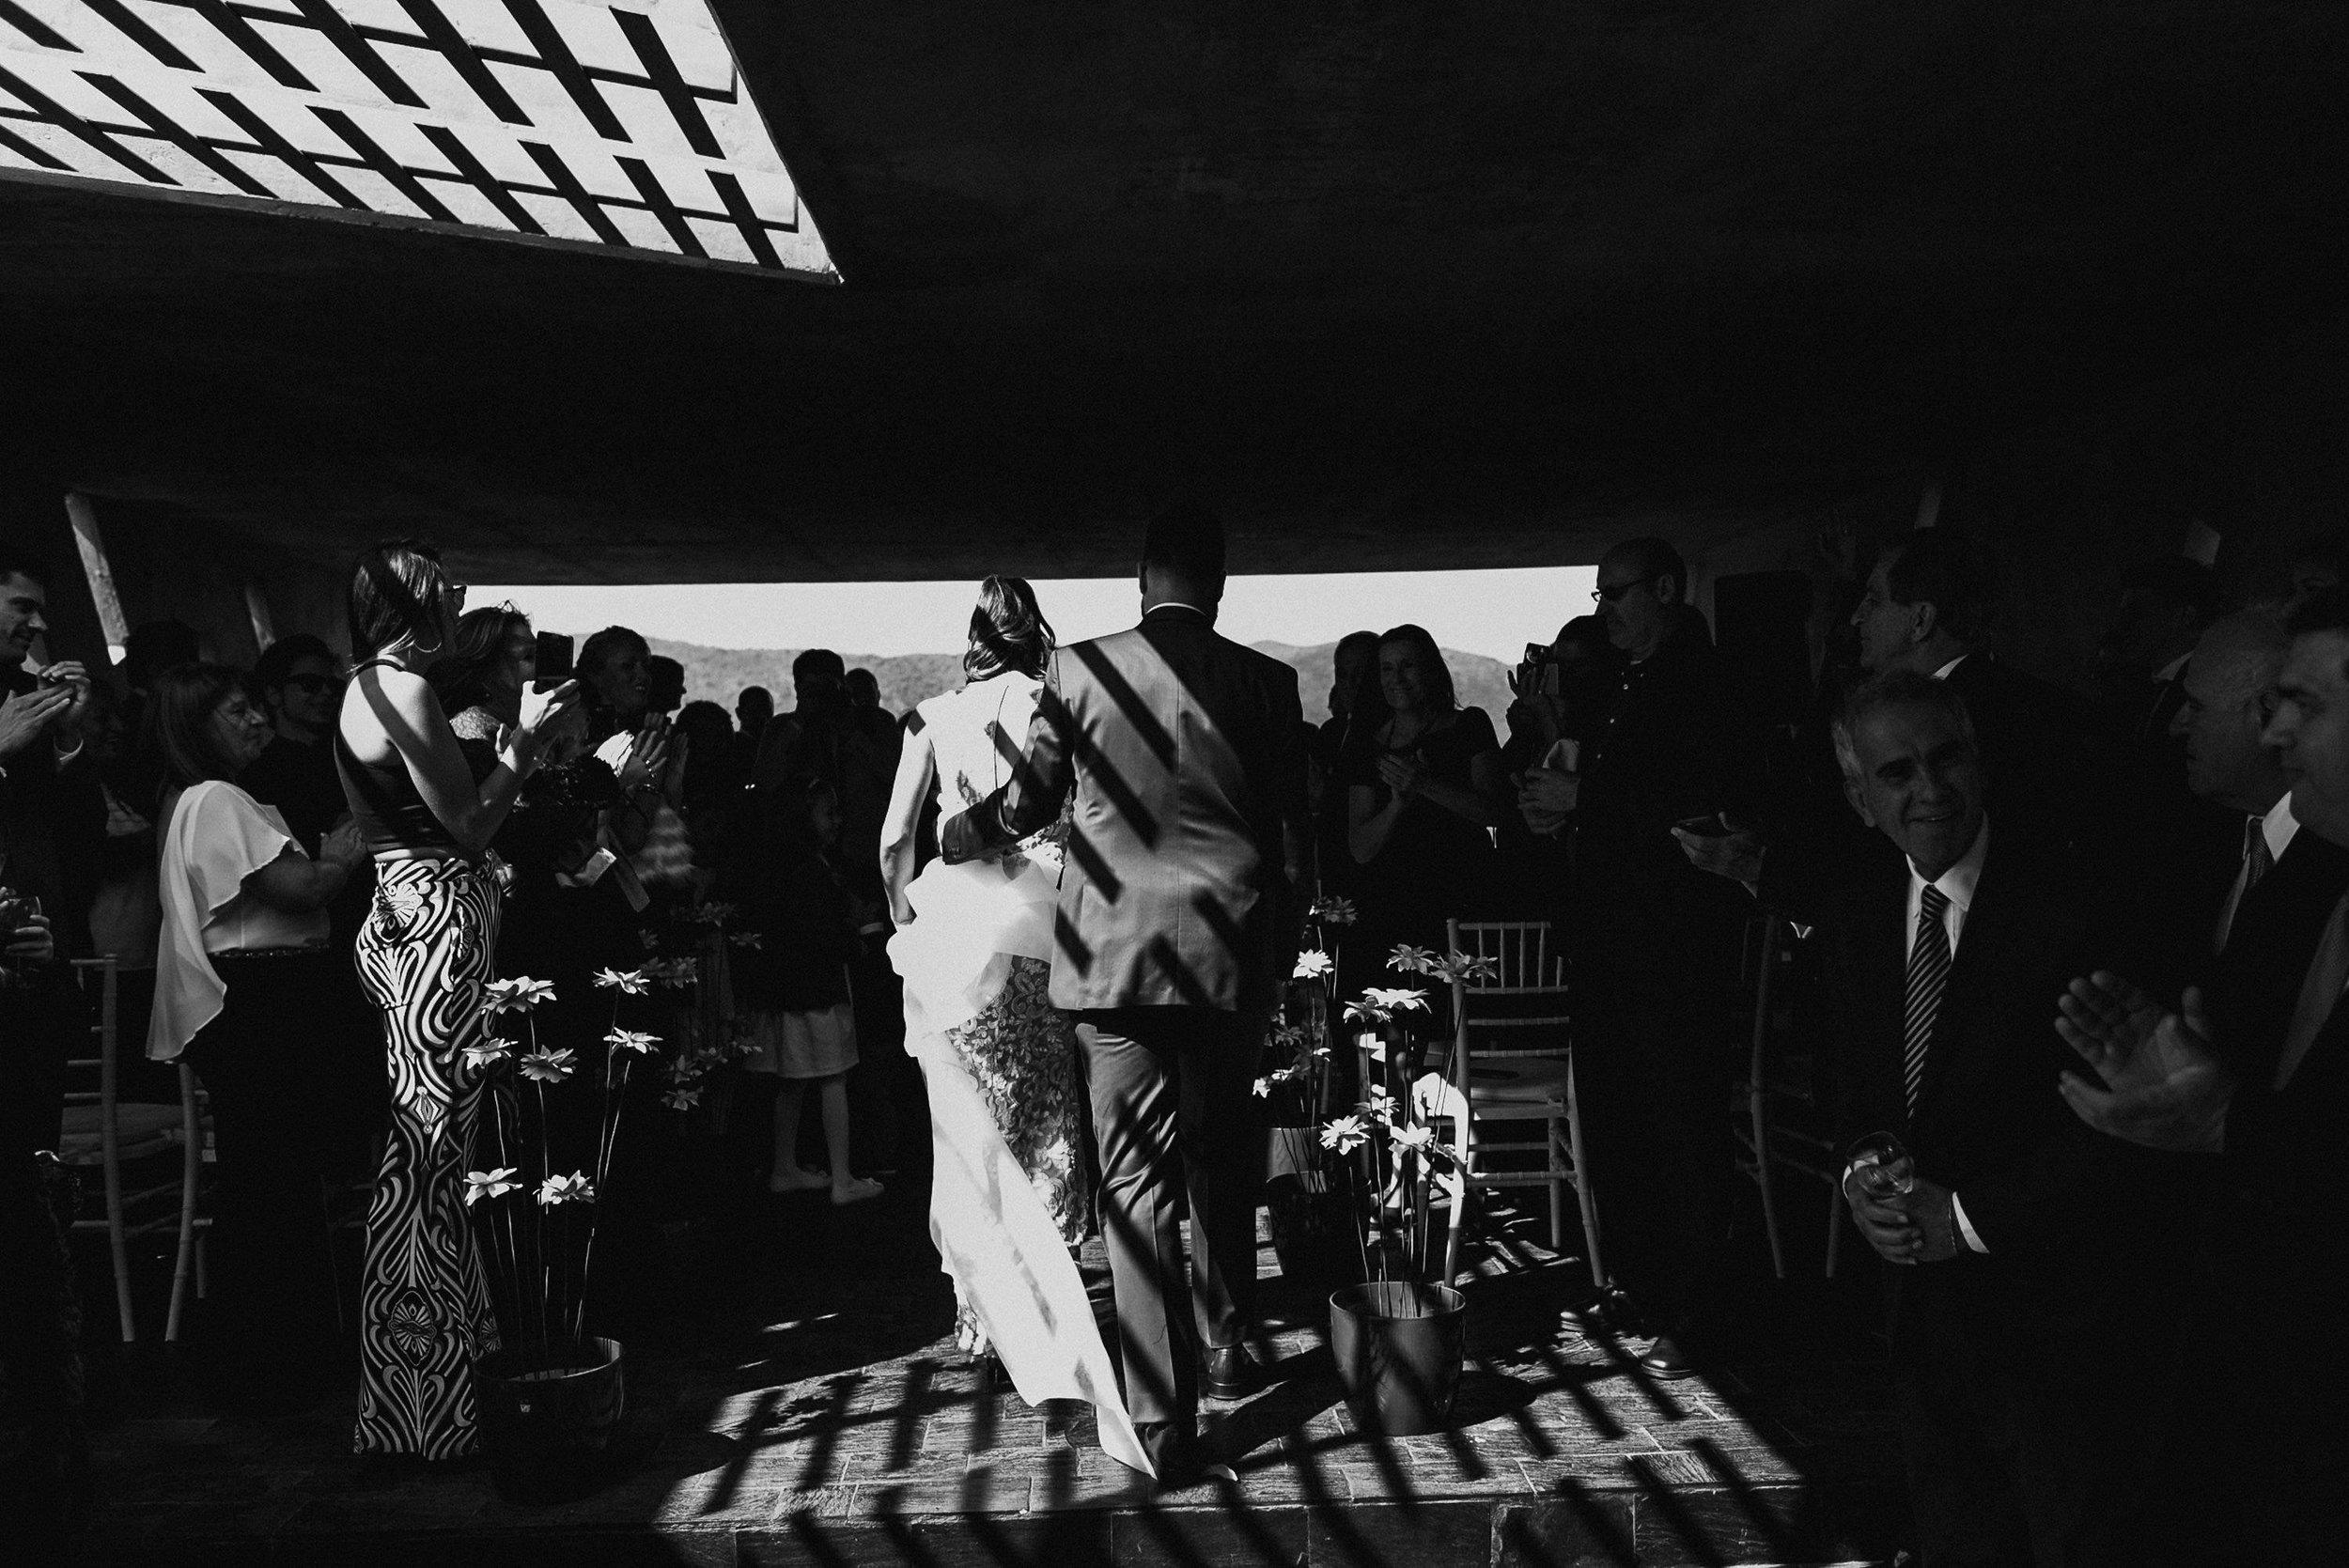 boda en carlos paz 026.JPG